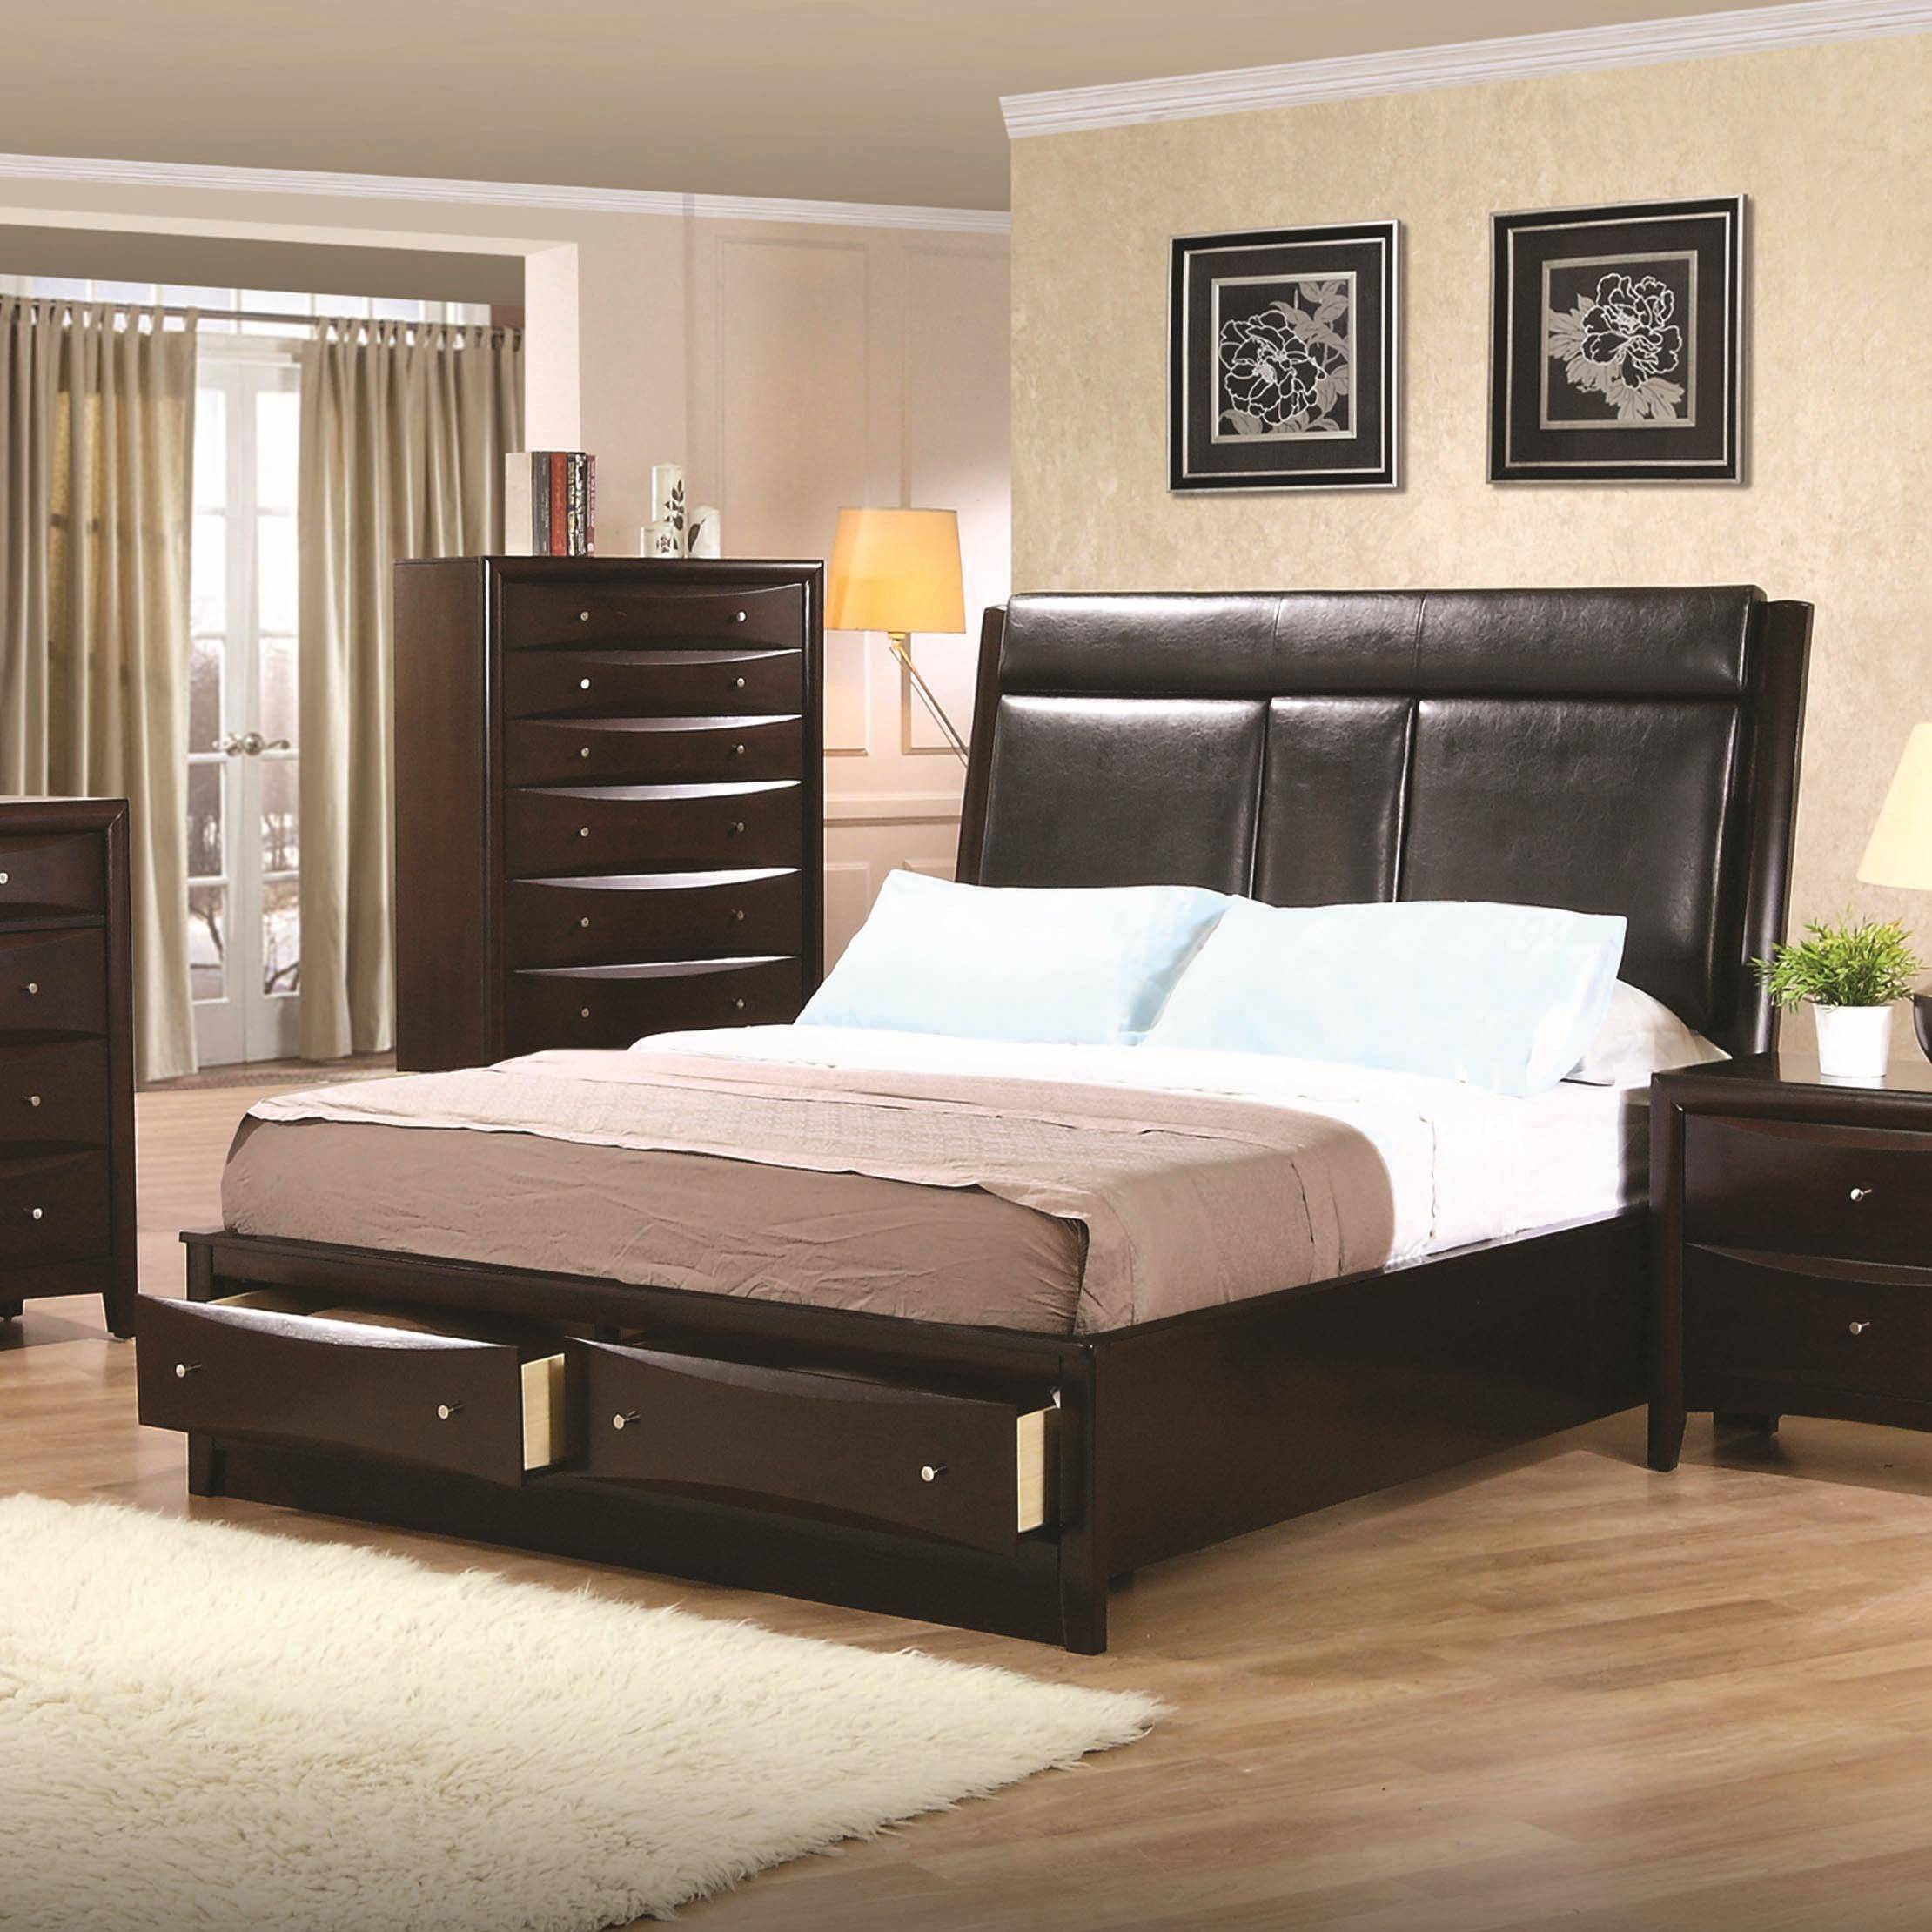 Phoenix Queen Storage Bed By Coaster It Has Cup Holders Bett Mobel Bett Mit Schubladen Schlafzimmer Design